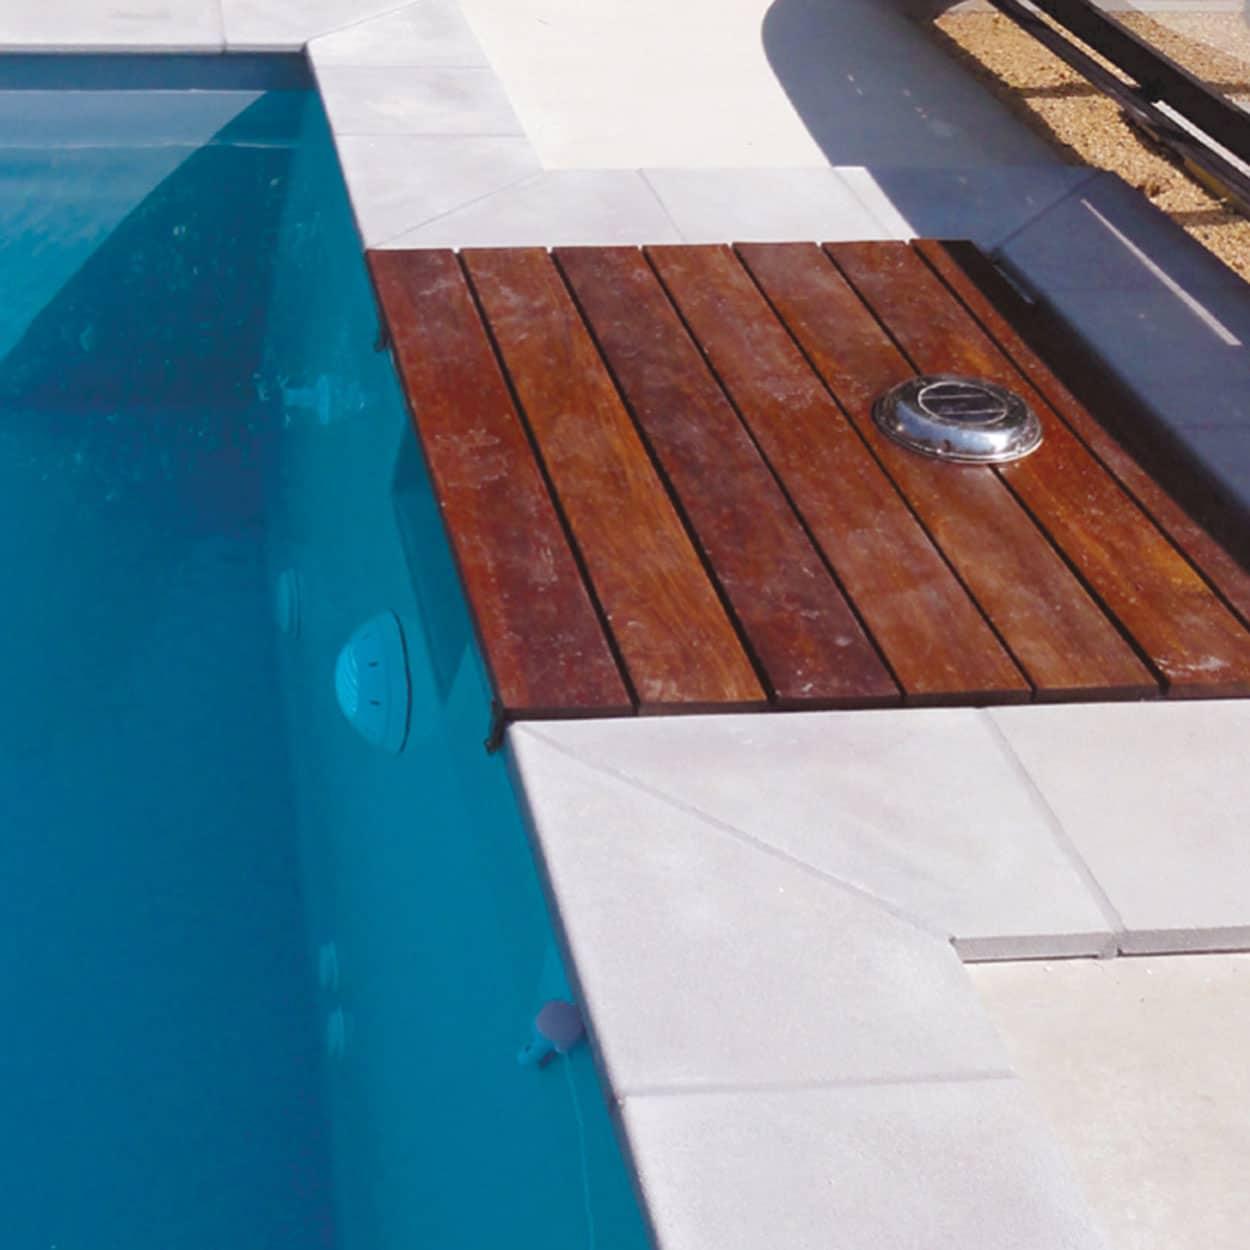 declinaison-plug-and-swim-detail Odalia - Déclinaison PLUG & SWIM - Les atouts